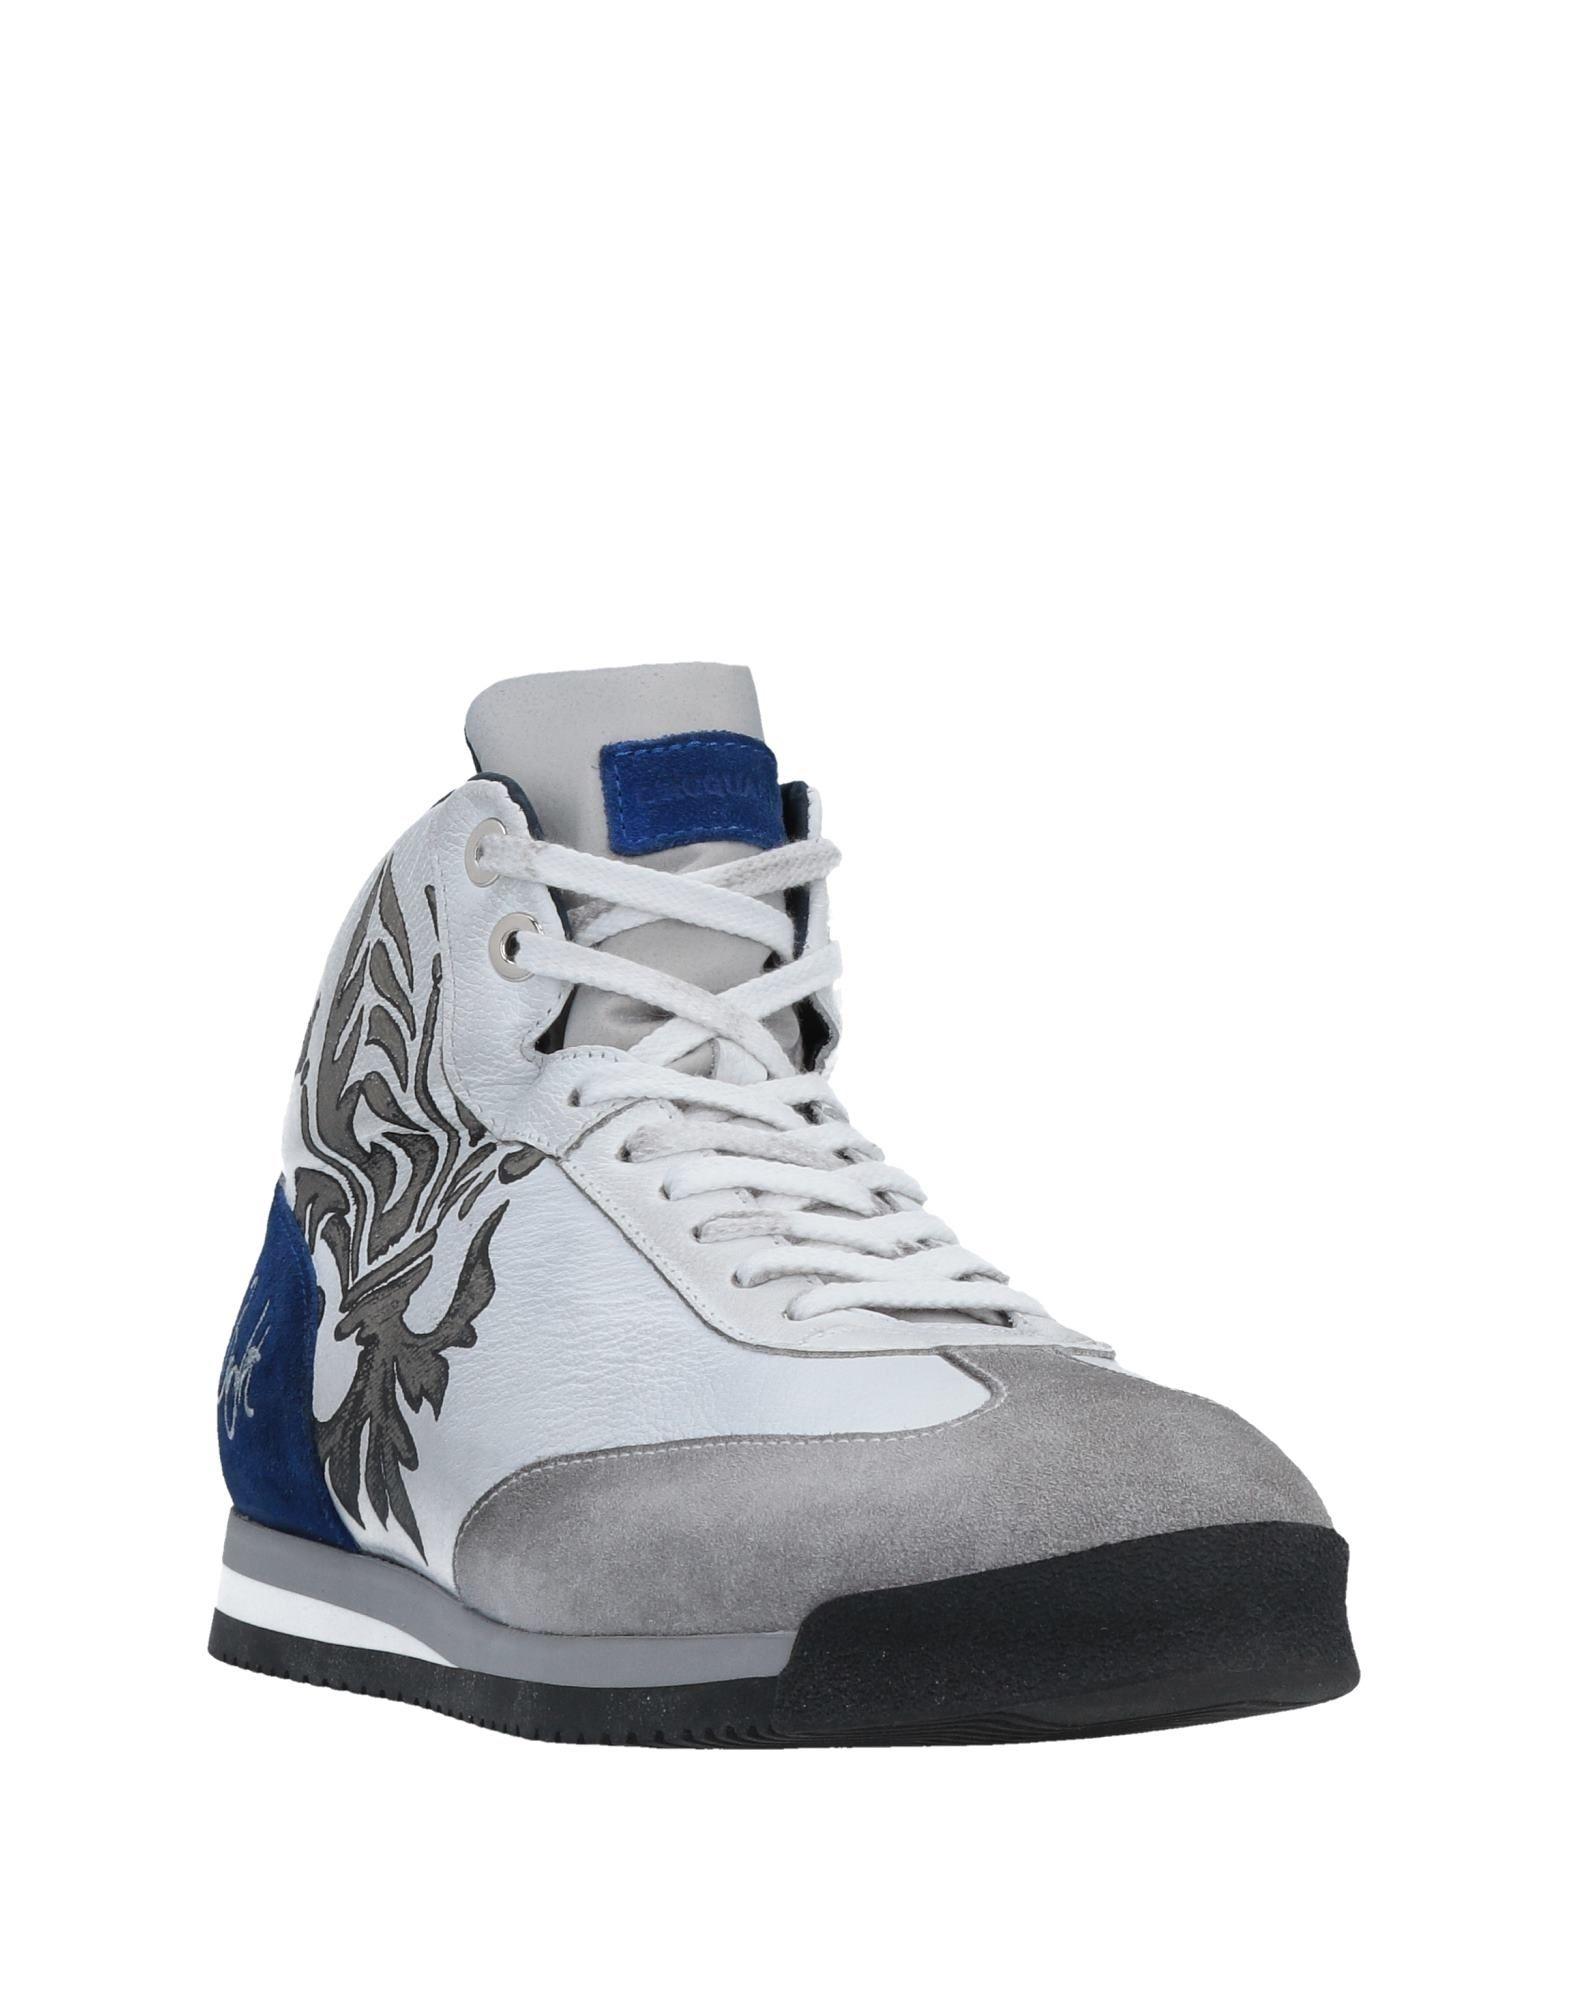 11510697KT D'Acquasparta Sneakers Herren  11510697KT  Heiße Schuhe 66a531